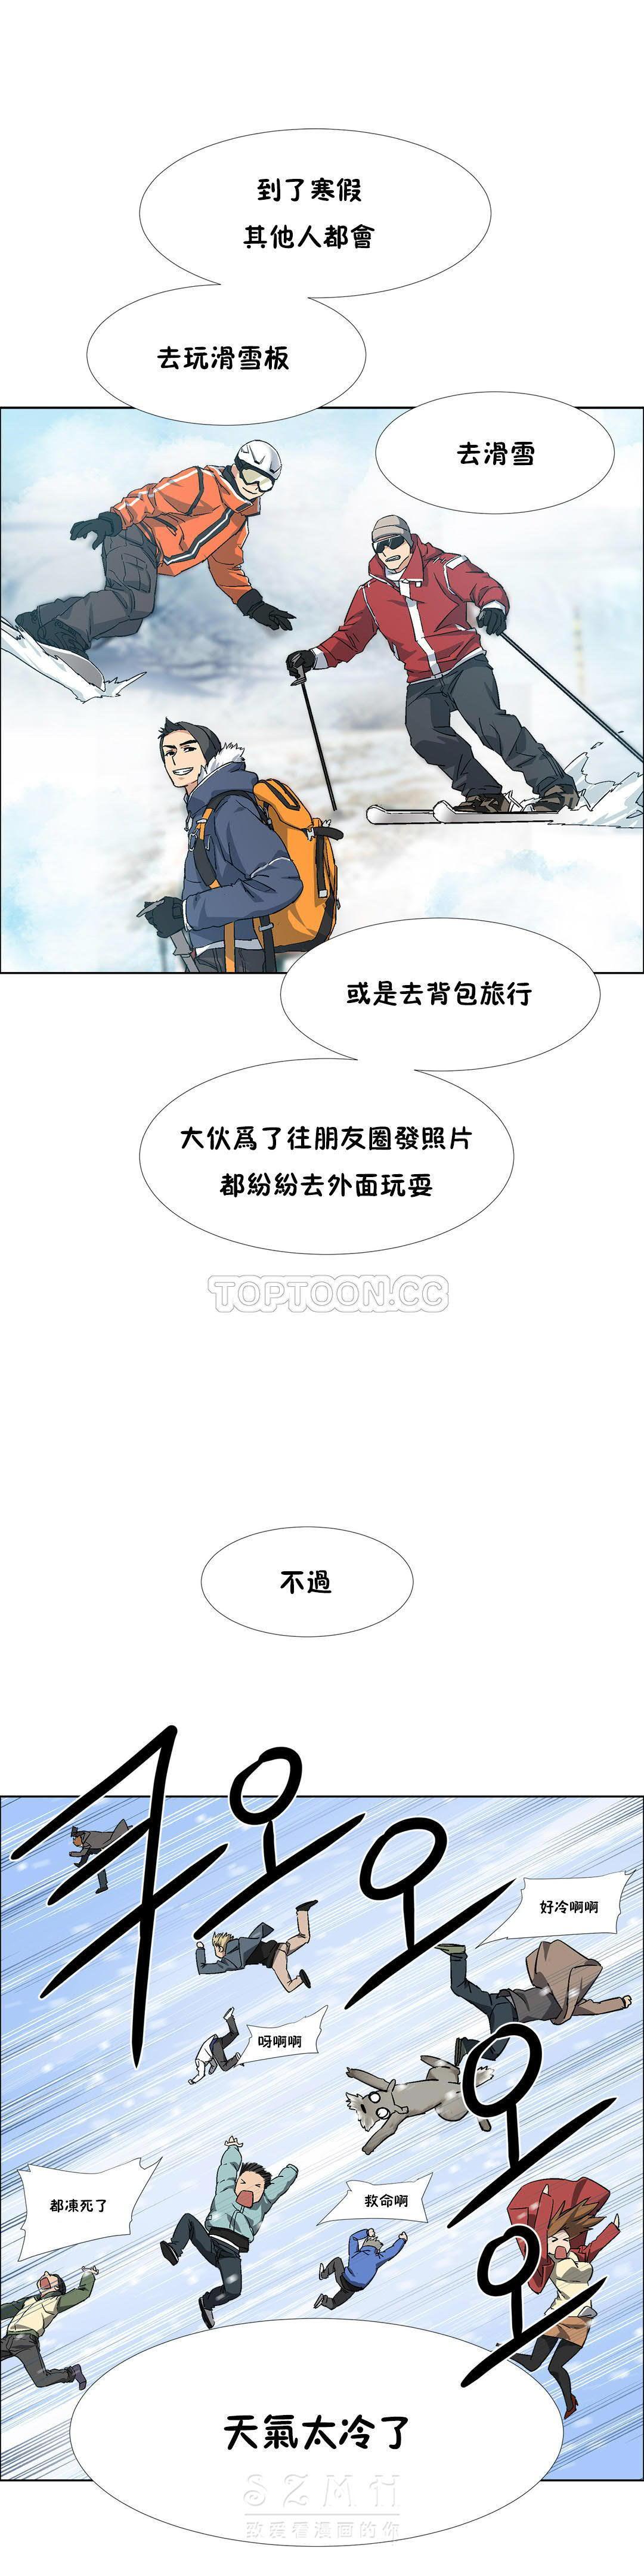 [Studio Wannabe] Rental Girls | 出租女郎 Ch. 33-58 [Chinese]  第二季 完结 11